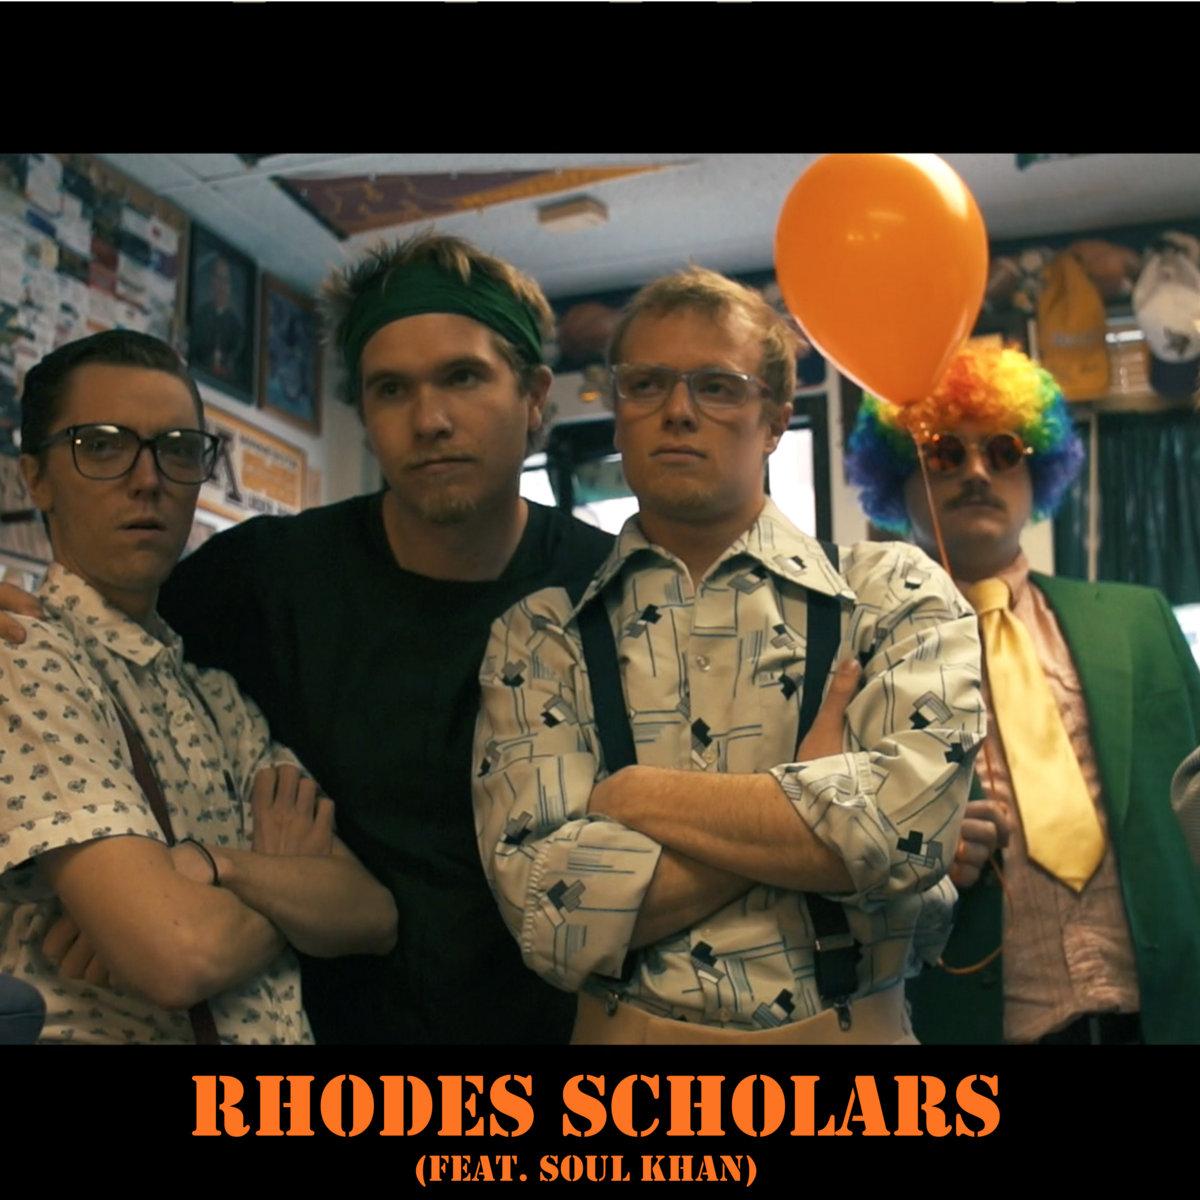 Rhodes Scholars (feat. Soul Khan) by Reverse Mechanic